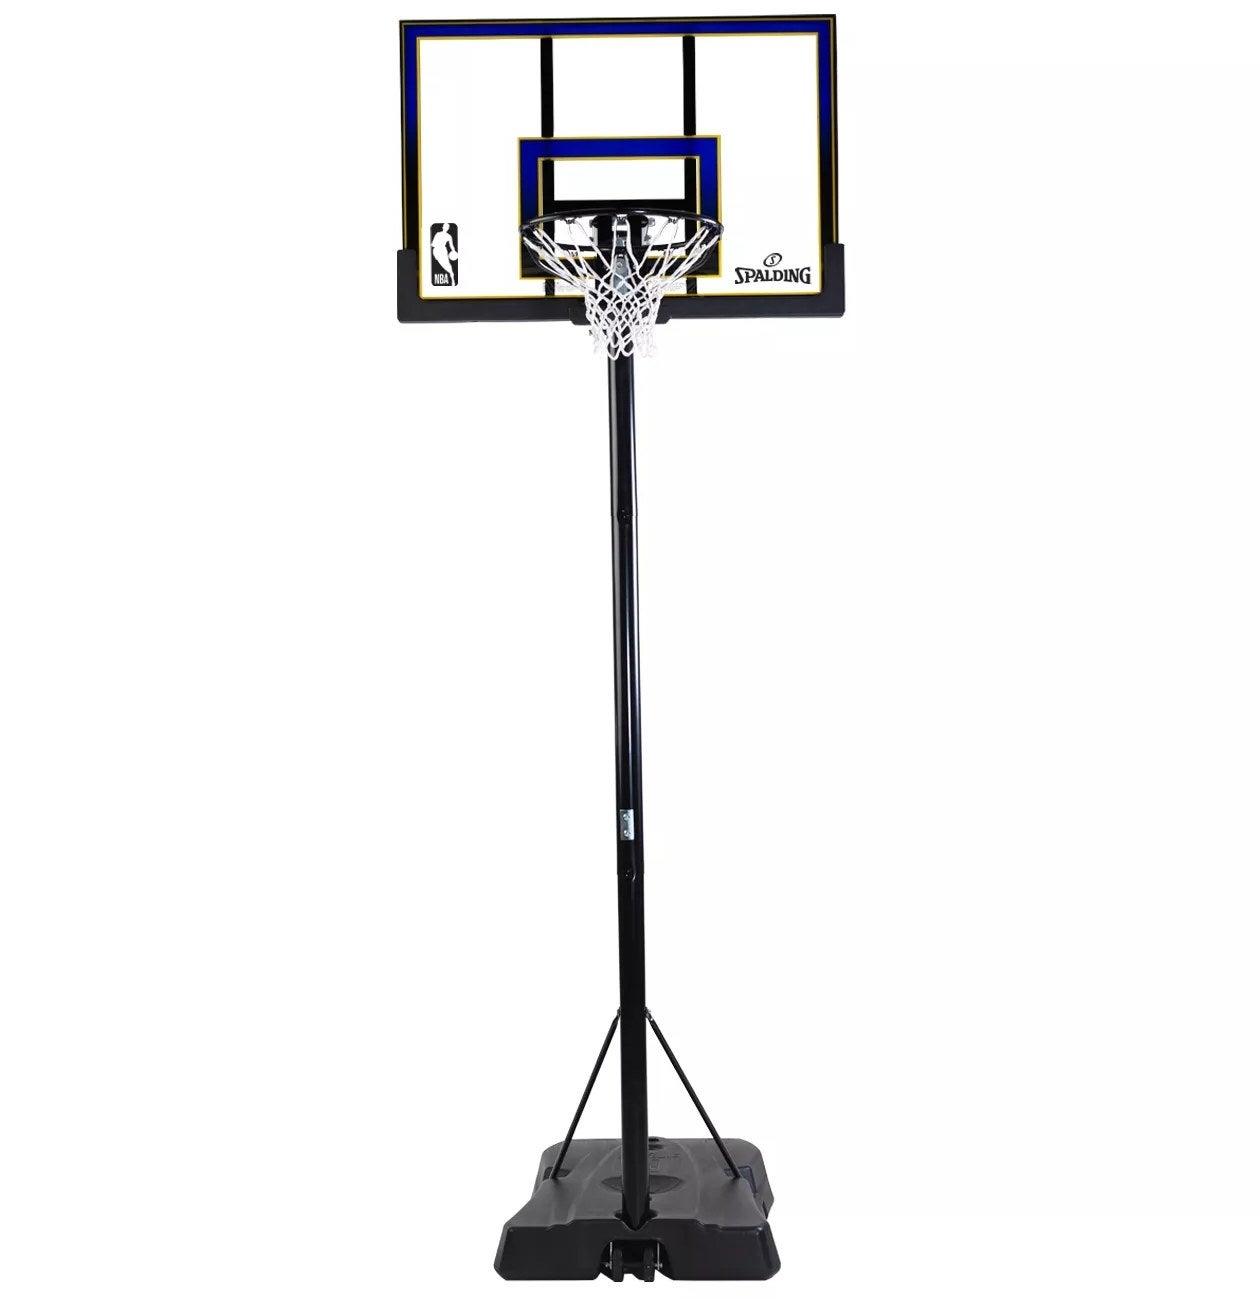 The NBA Spalding basketball hoop